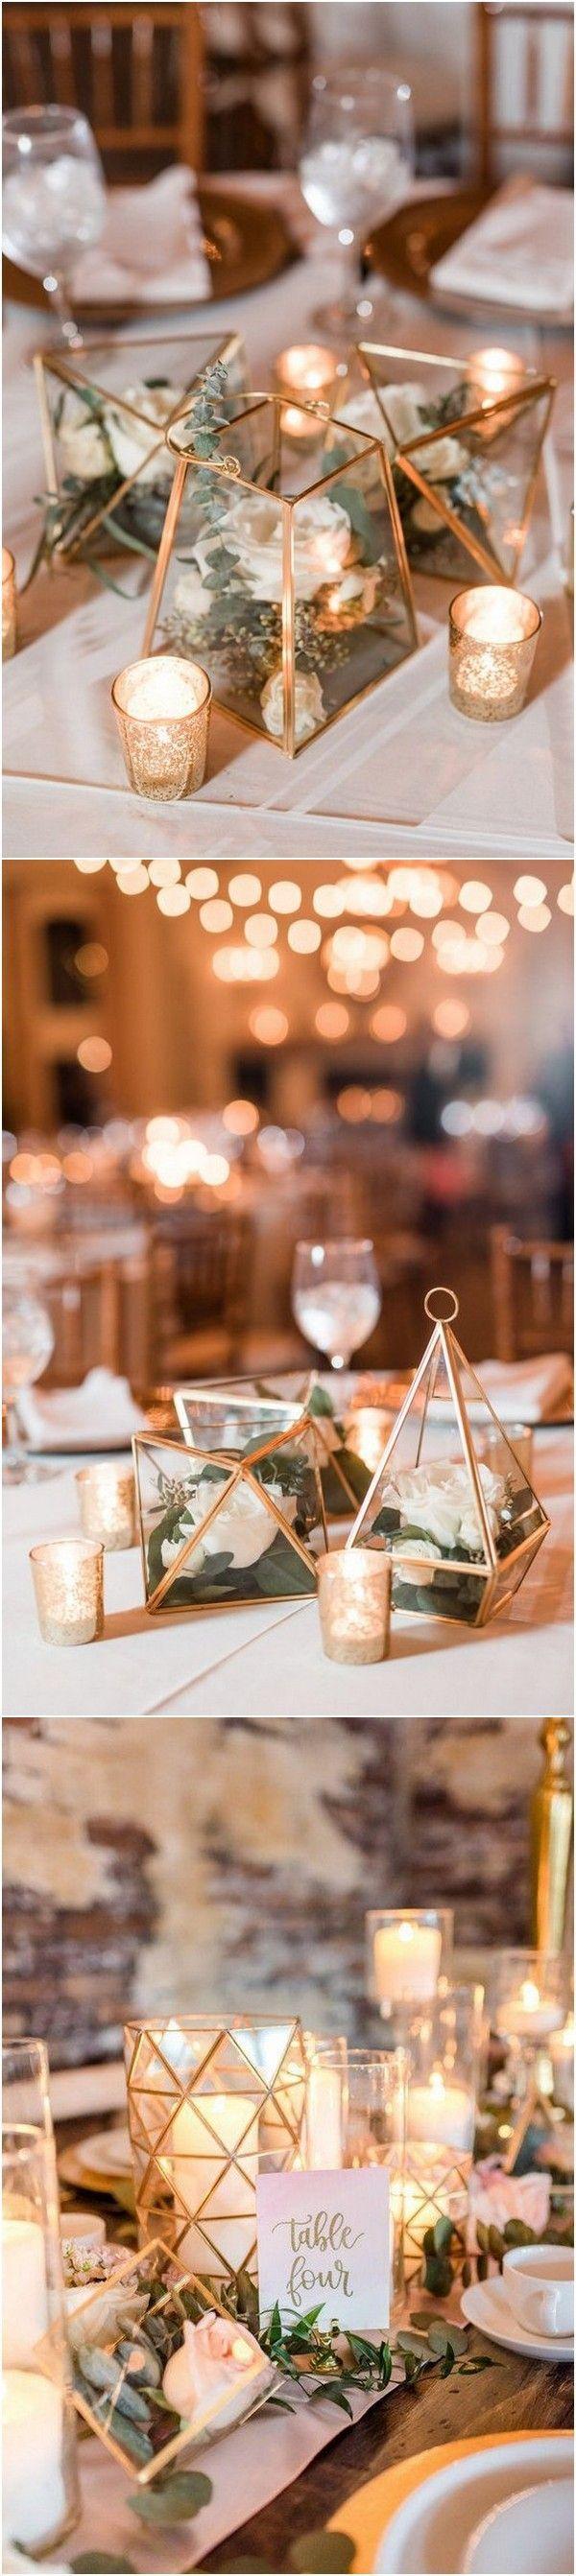 Trending – 20 Industrial Geometric Wedding Centerpieces for 2019 Trending – 20 Industrial Geome